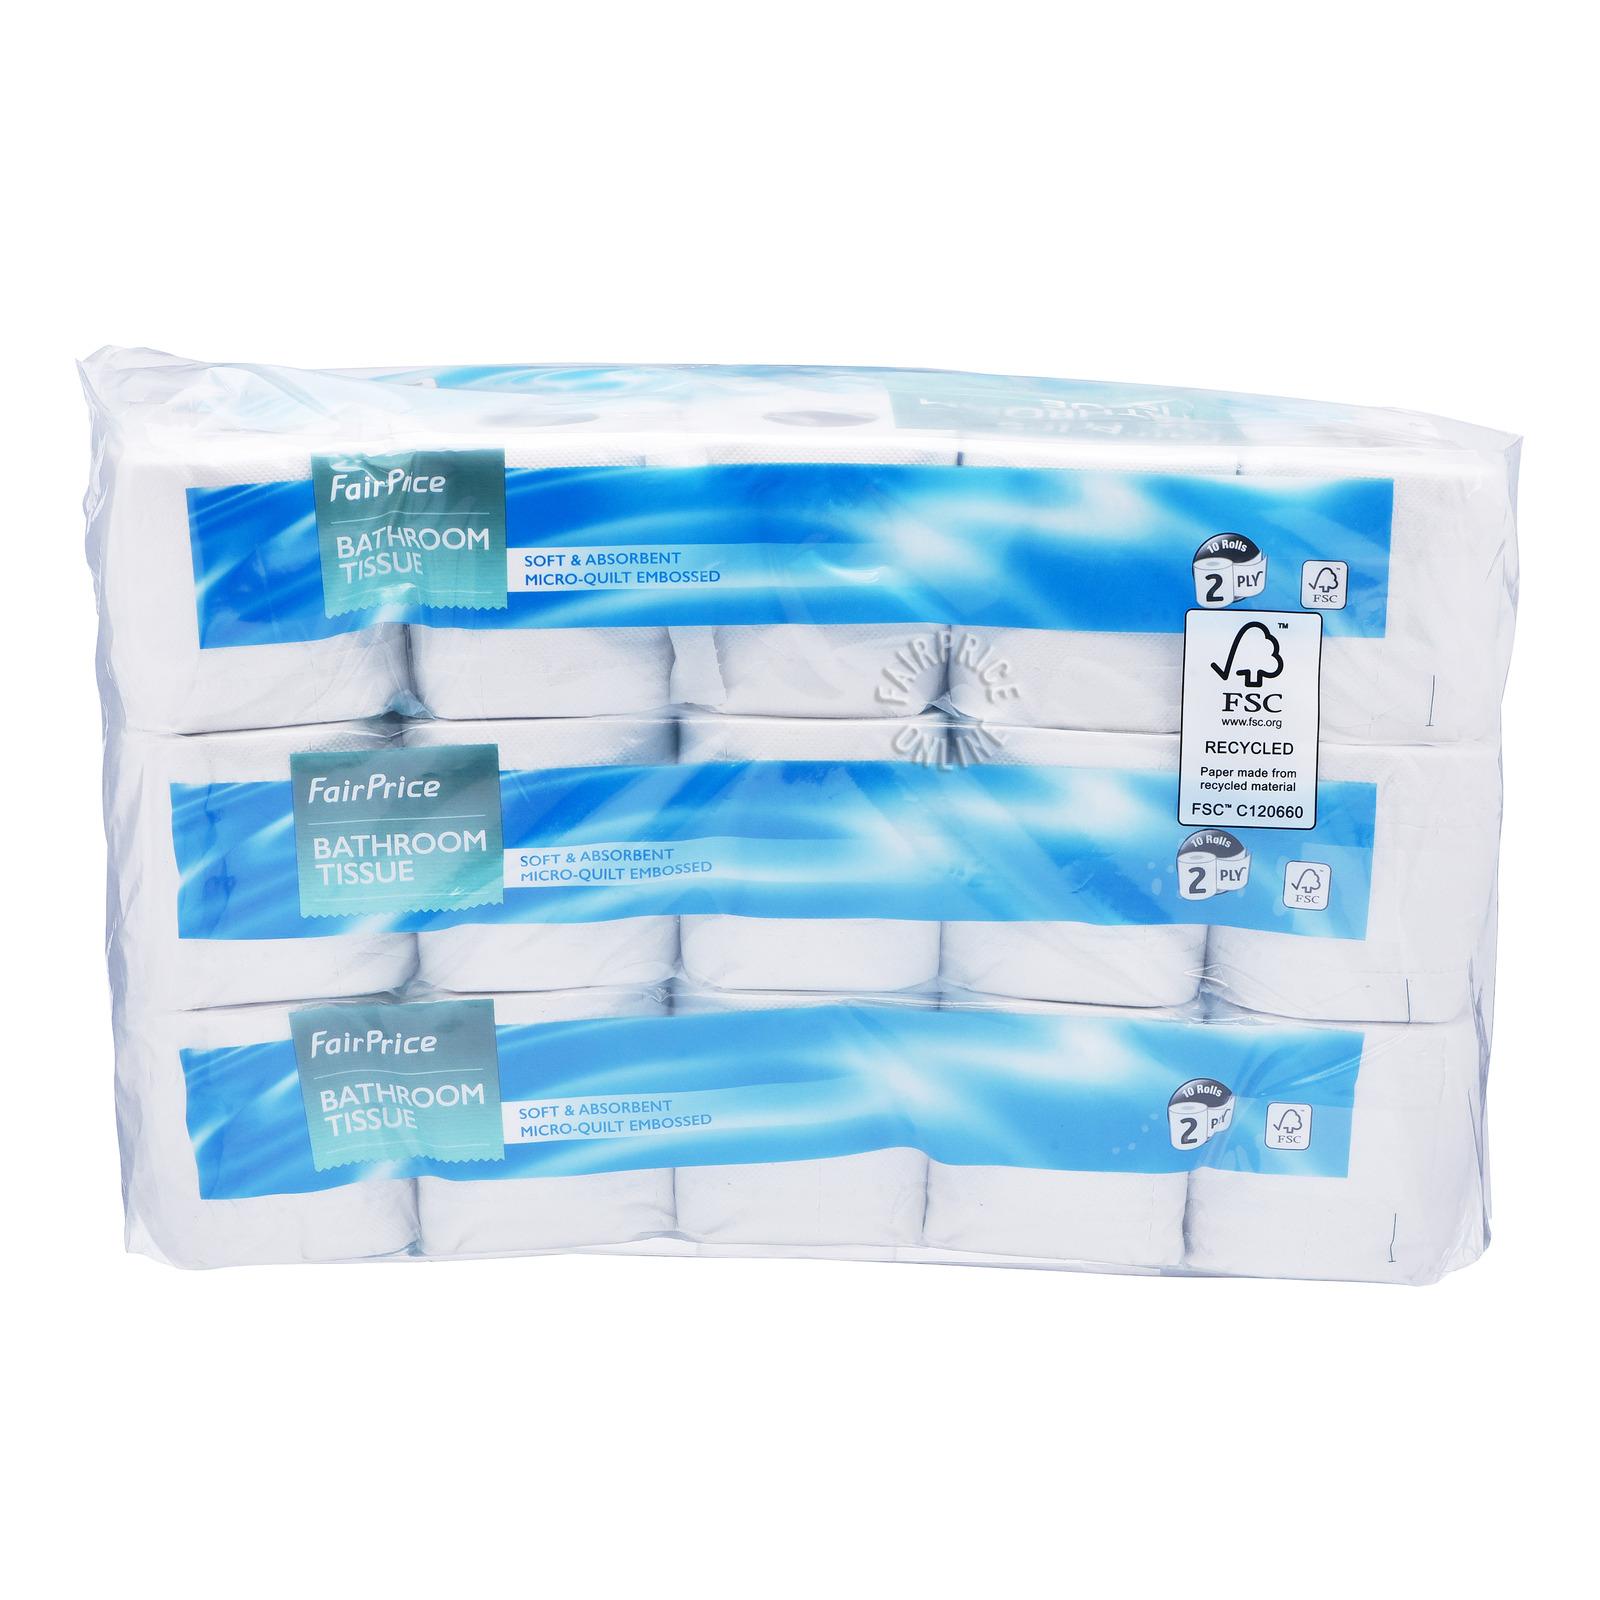 FairPrice Bathroom Tissue Rolls (2ply)